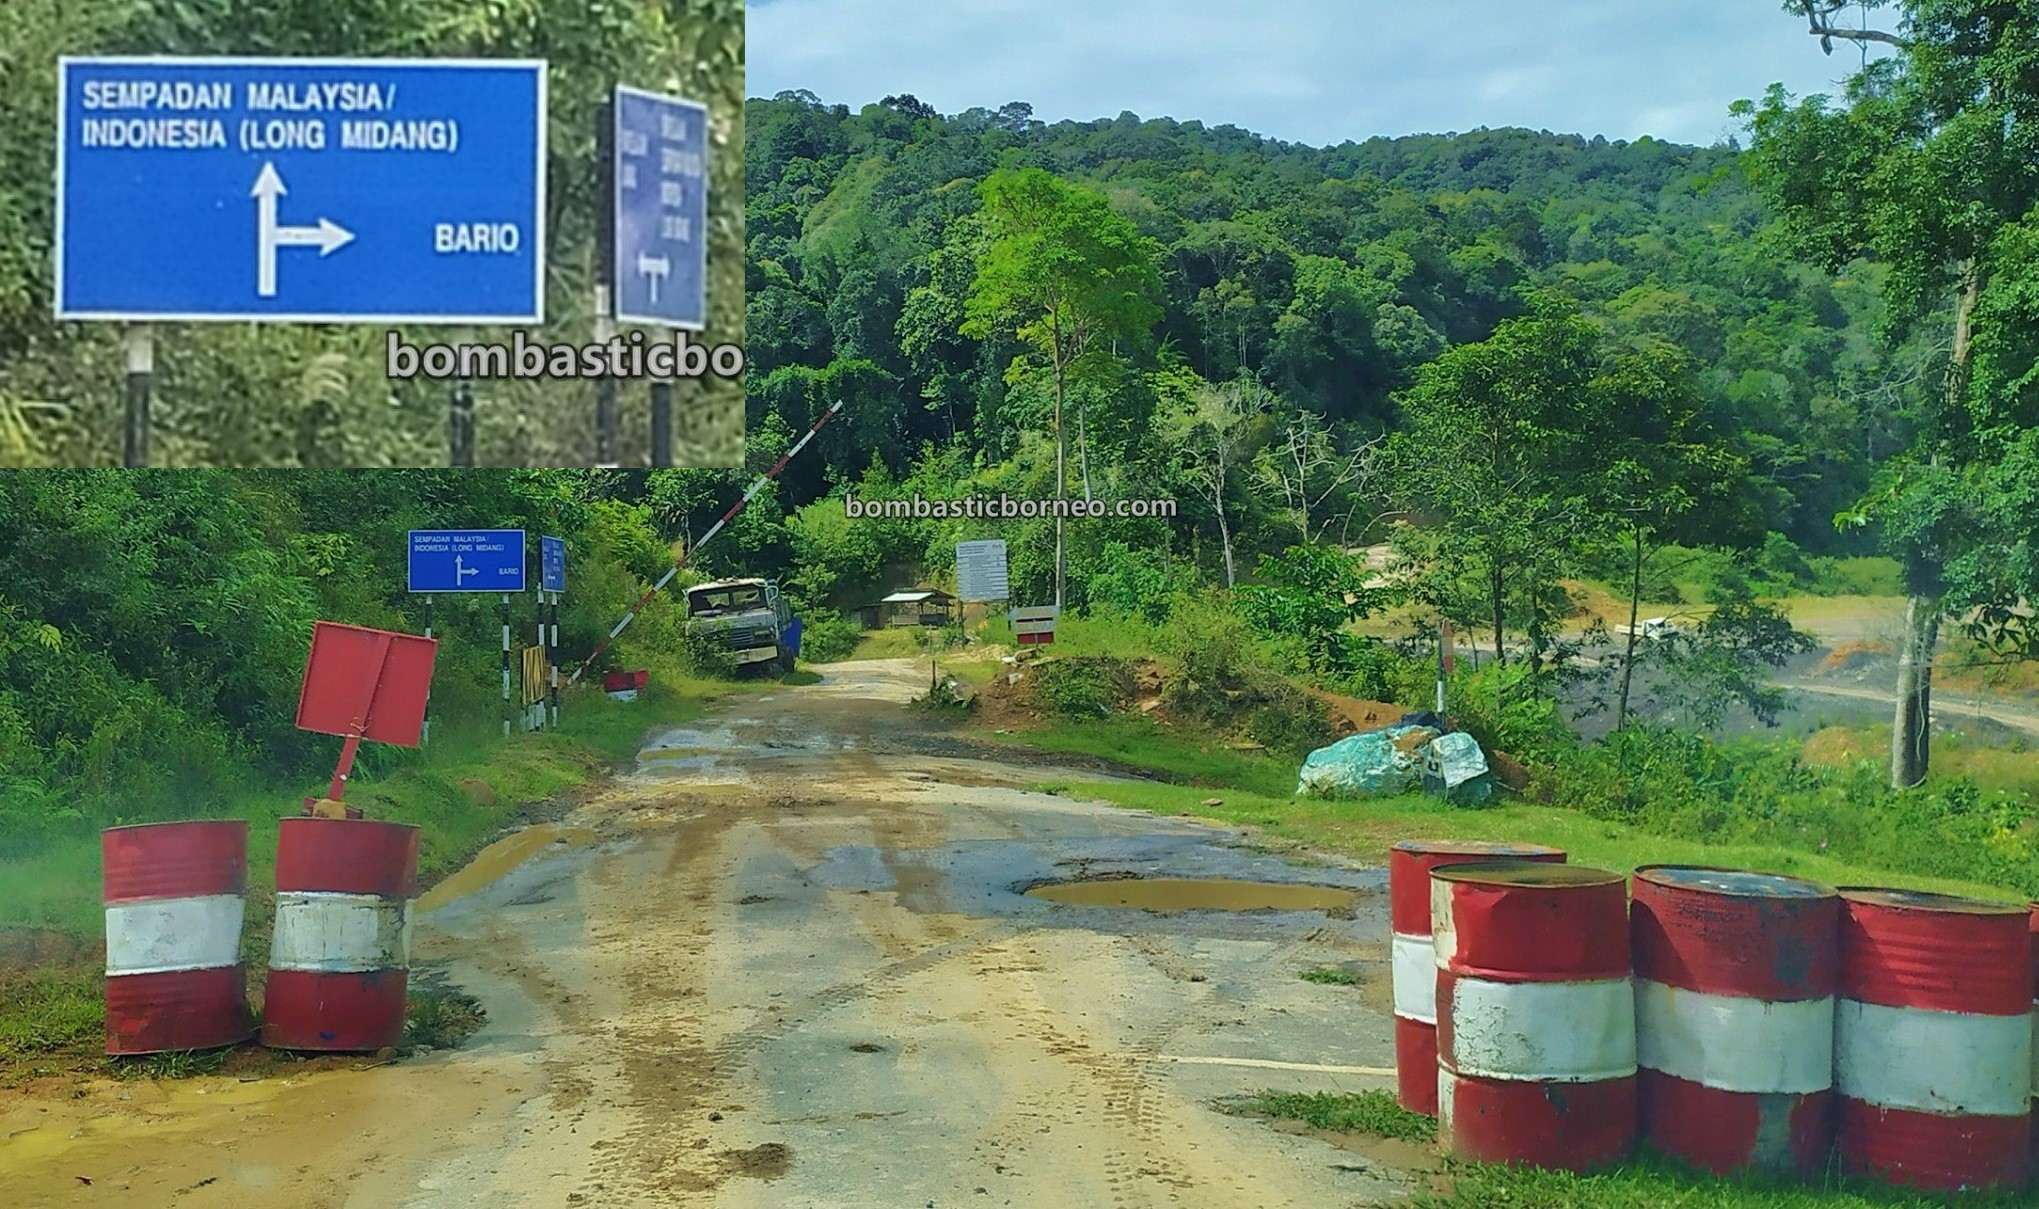 Border Checkpoint, Pos Imigresen Malaysia, Immigration, Krayan, Long Midang, adventure, exploration, Interior Village, Tourism, tourist attraction, travel guide, Trans Borneo, 跨境婆罗洲游踪, 马来西亚砂拉越, 巴卡拉兰边境检查站